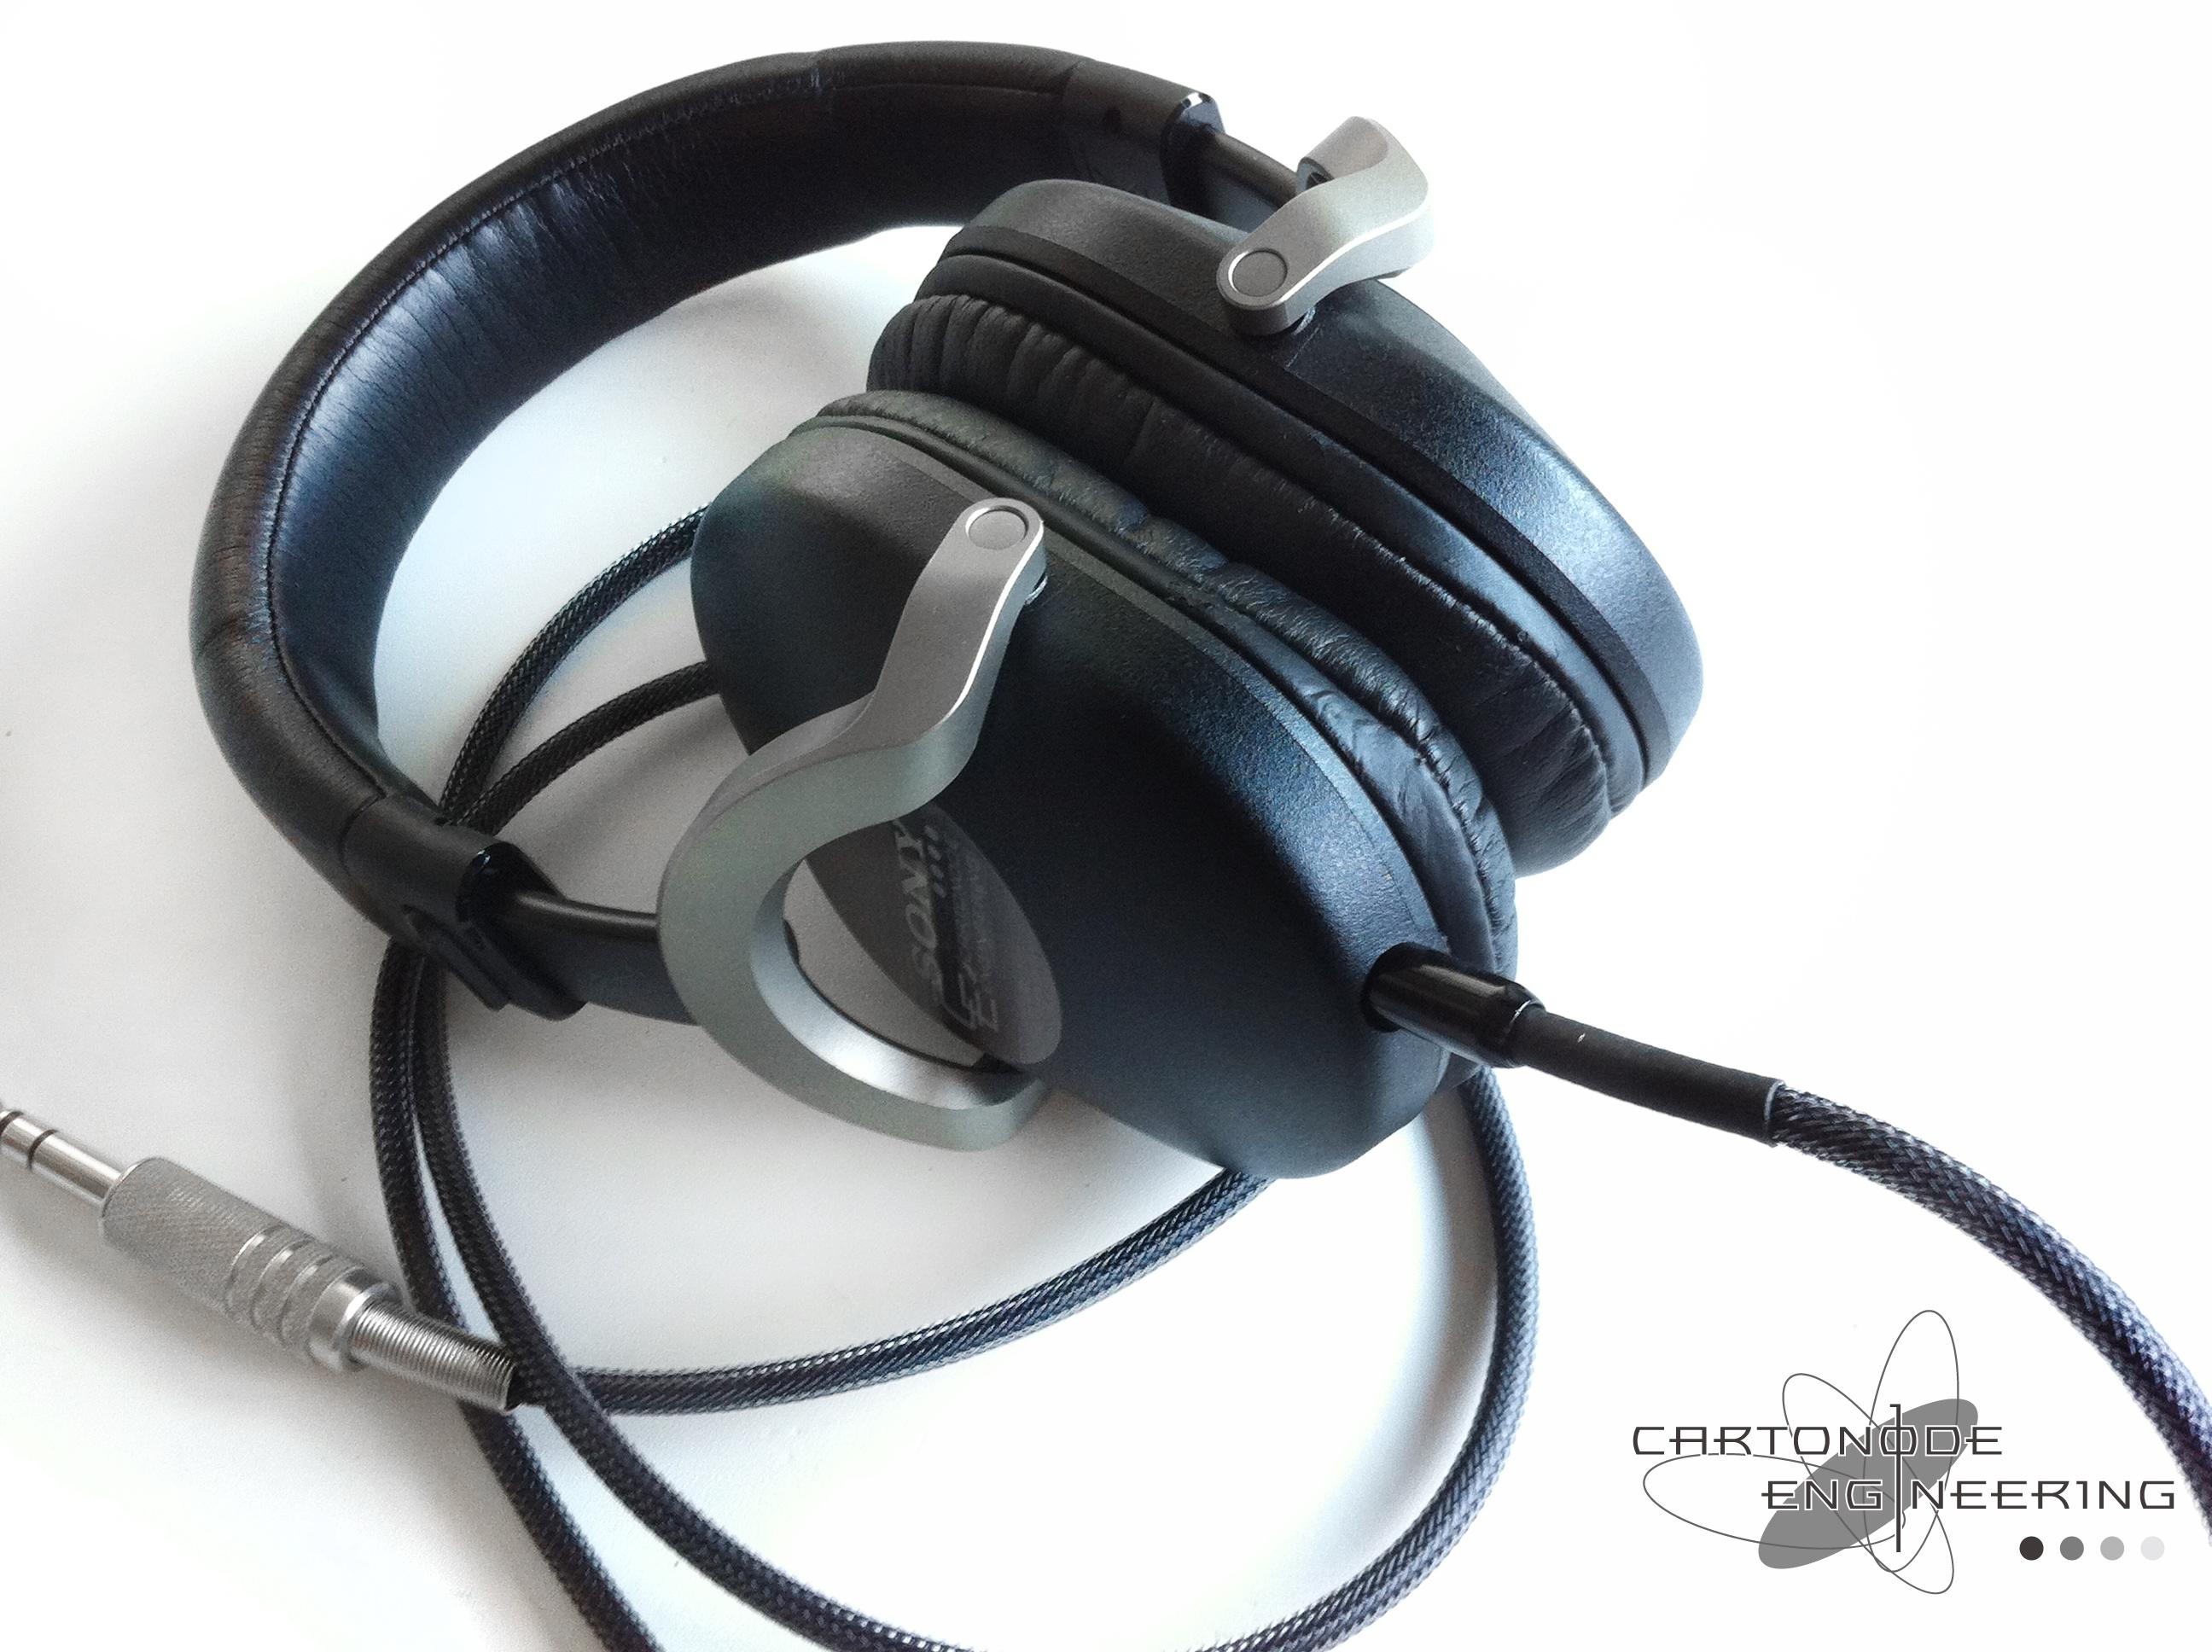 MDR-ZX700脱着 C.E.スペシャルMOD